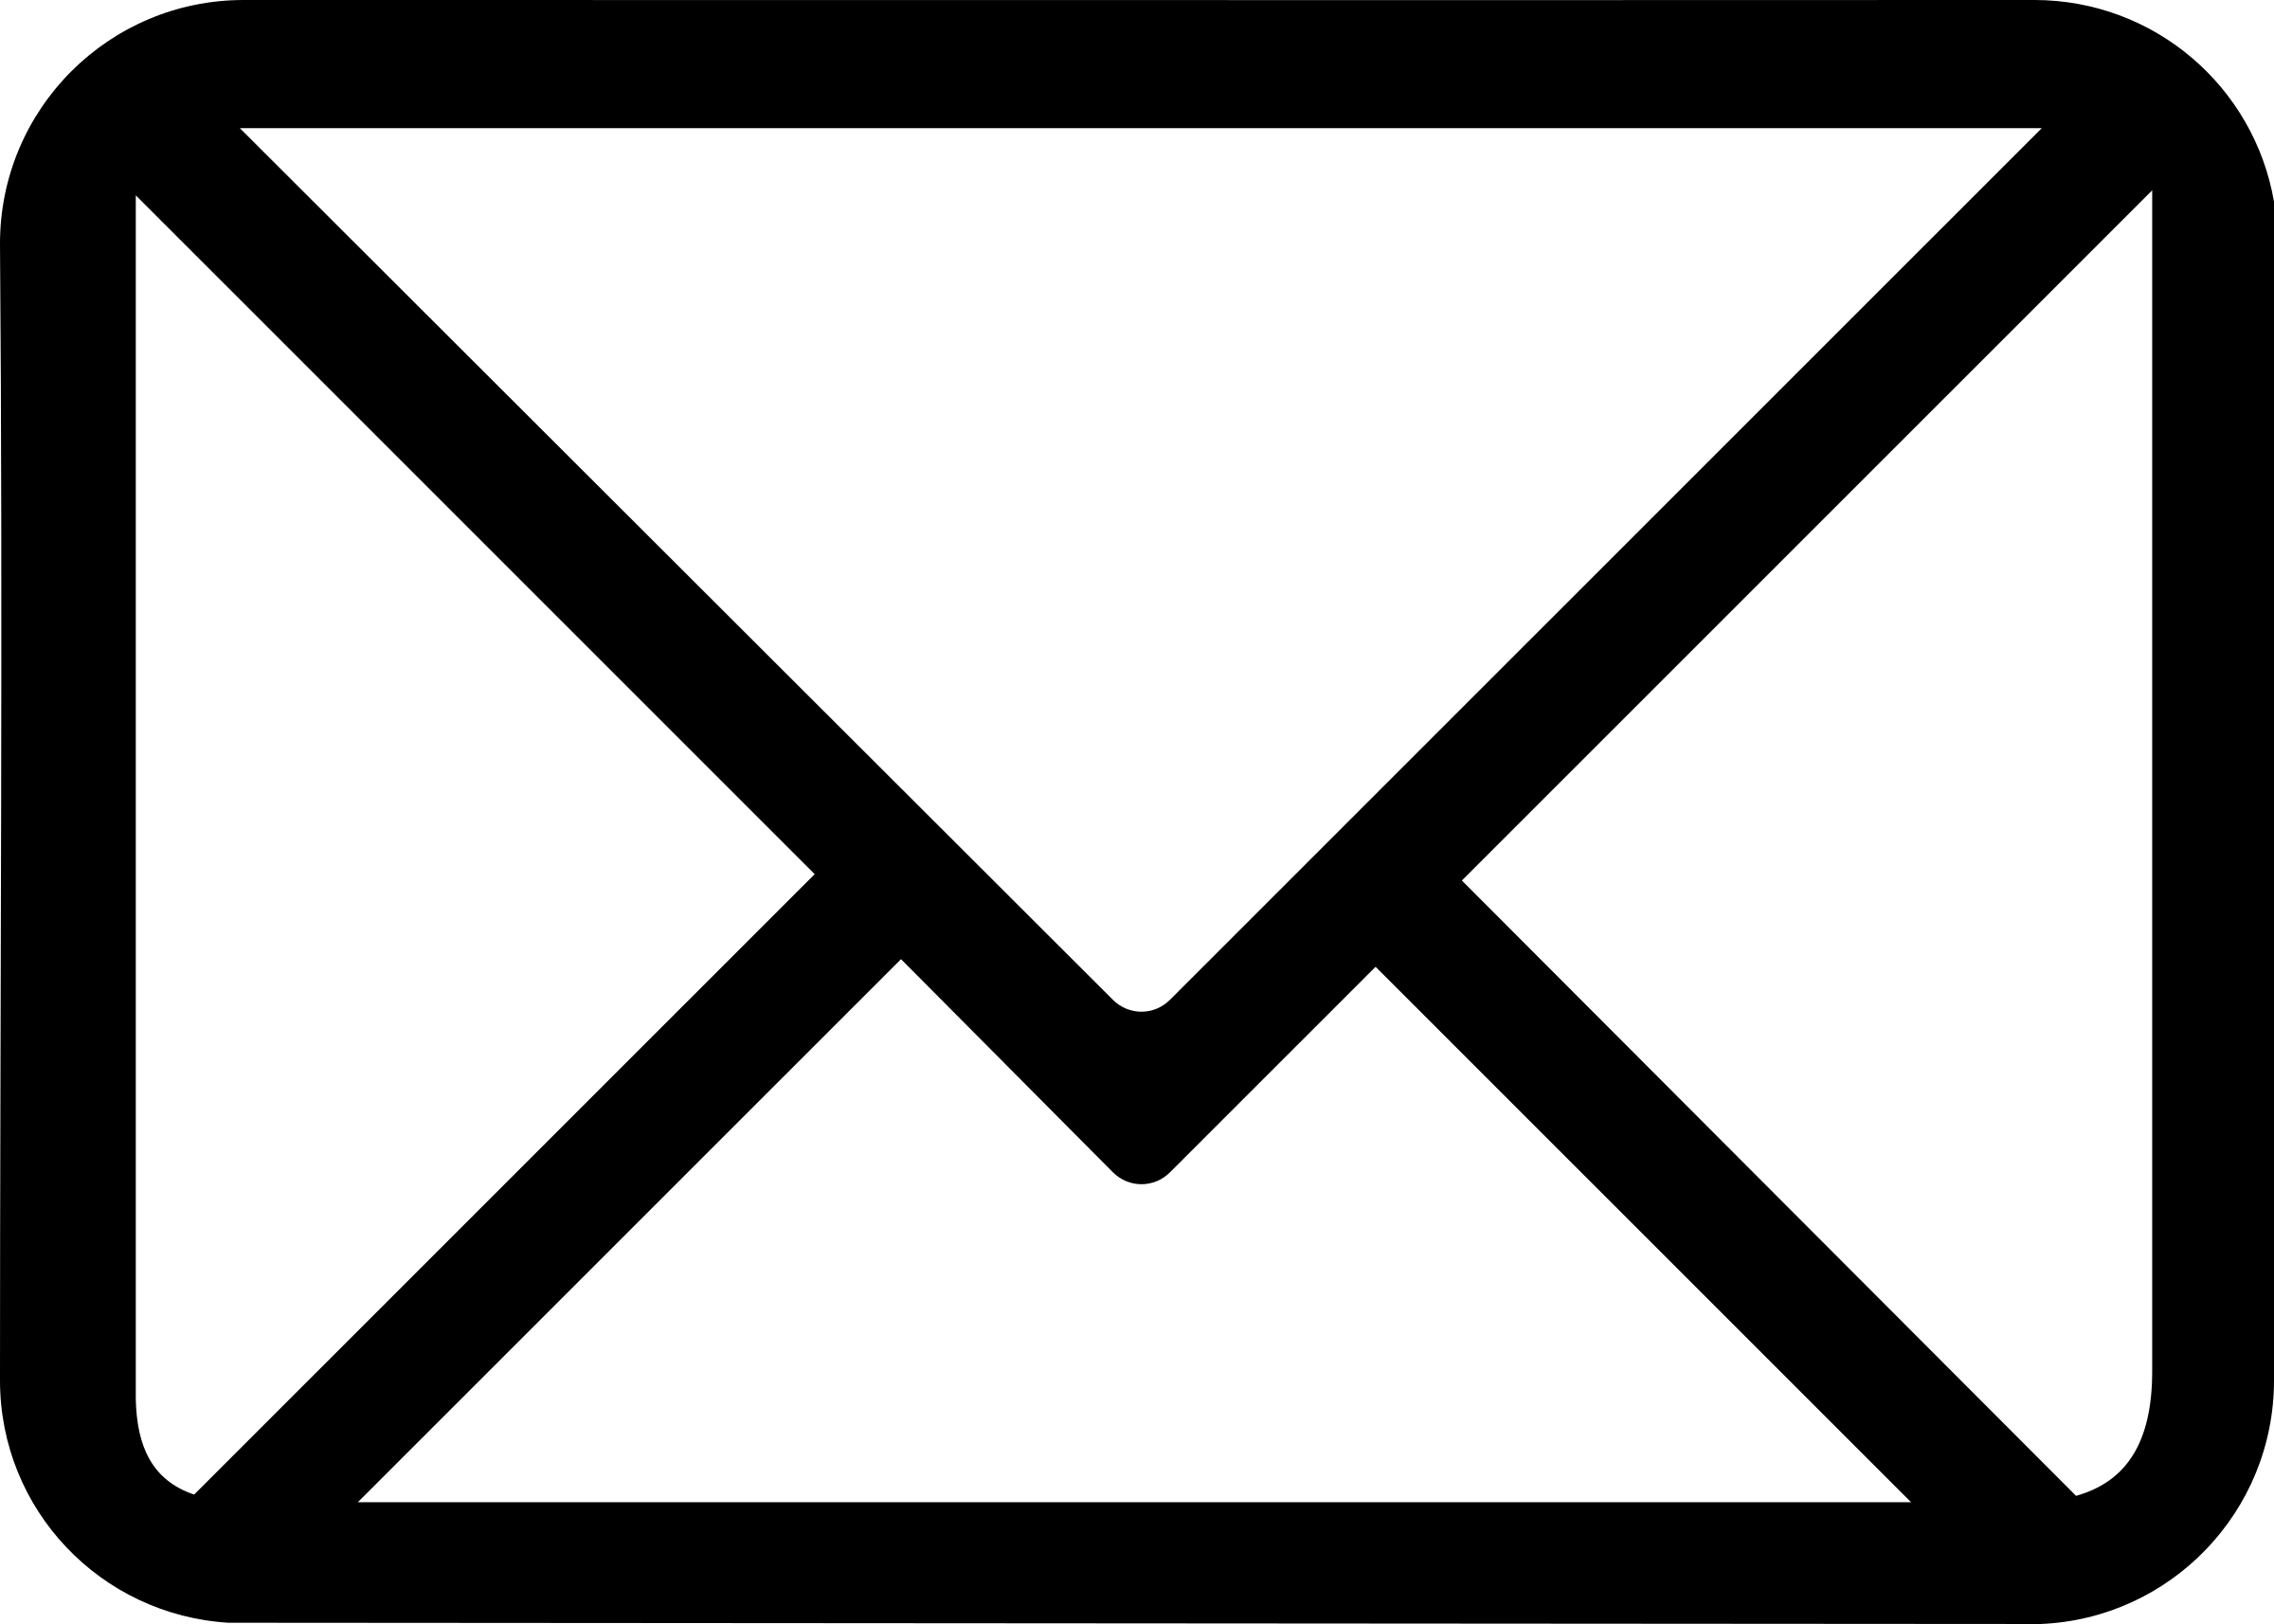 Email icon transparent png. Envelope clipart large envelope